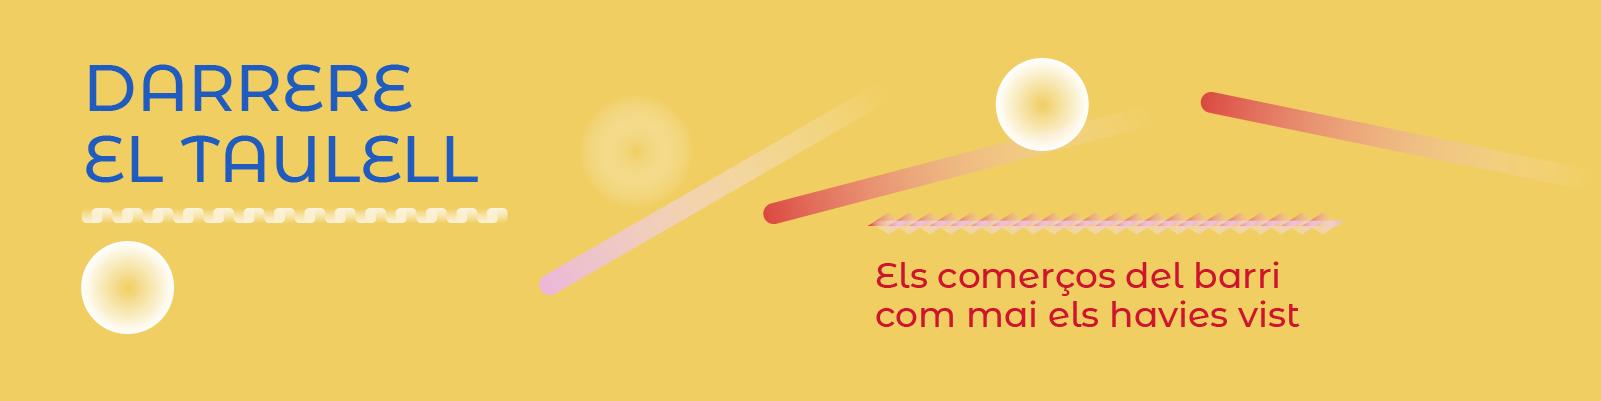 https://ajuntament.barcelona.cat/comerc/sites/default/files/revslider/image/banner_com-06_0.png